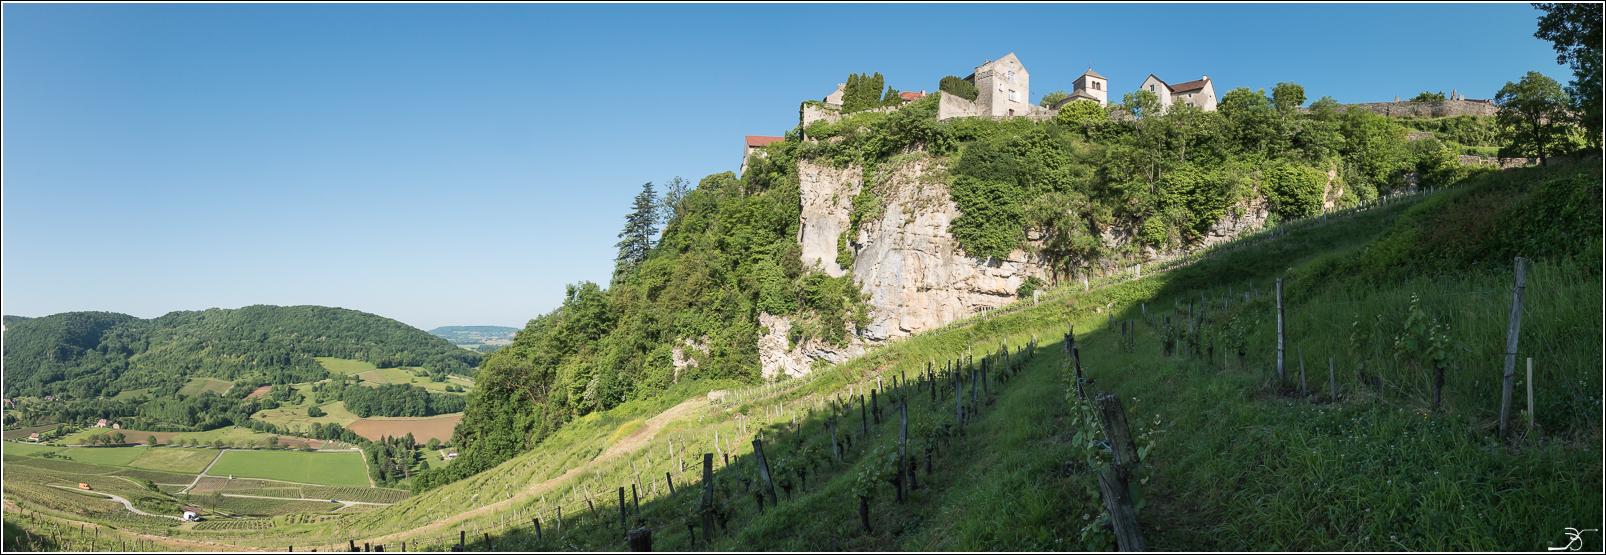 PBVF 60: Chateau-Chalon 323131LR6P1110032Panorama